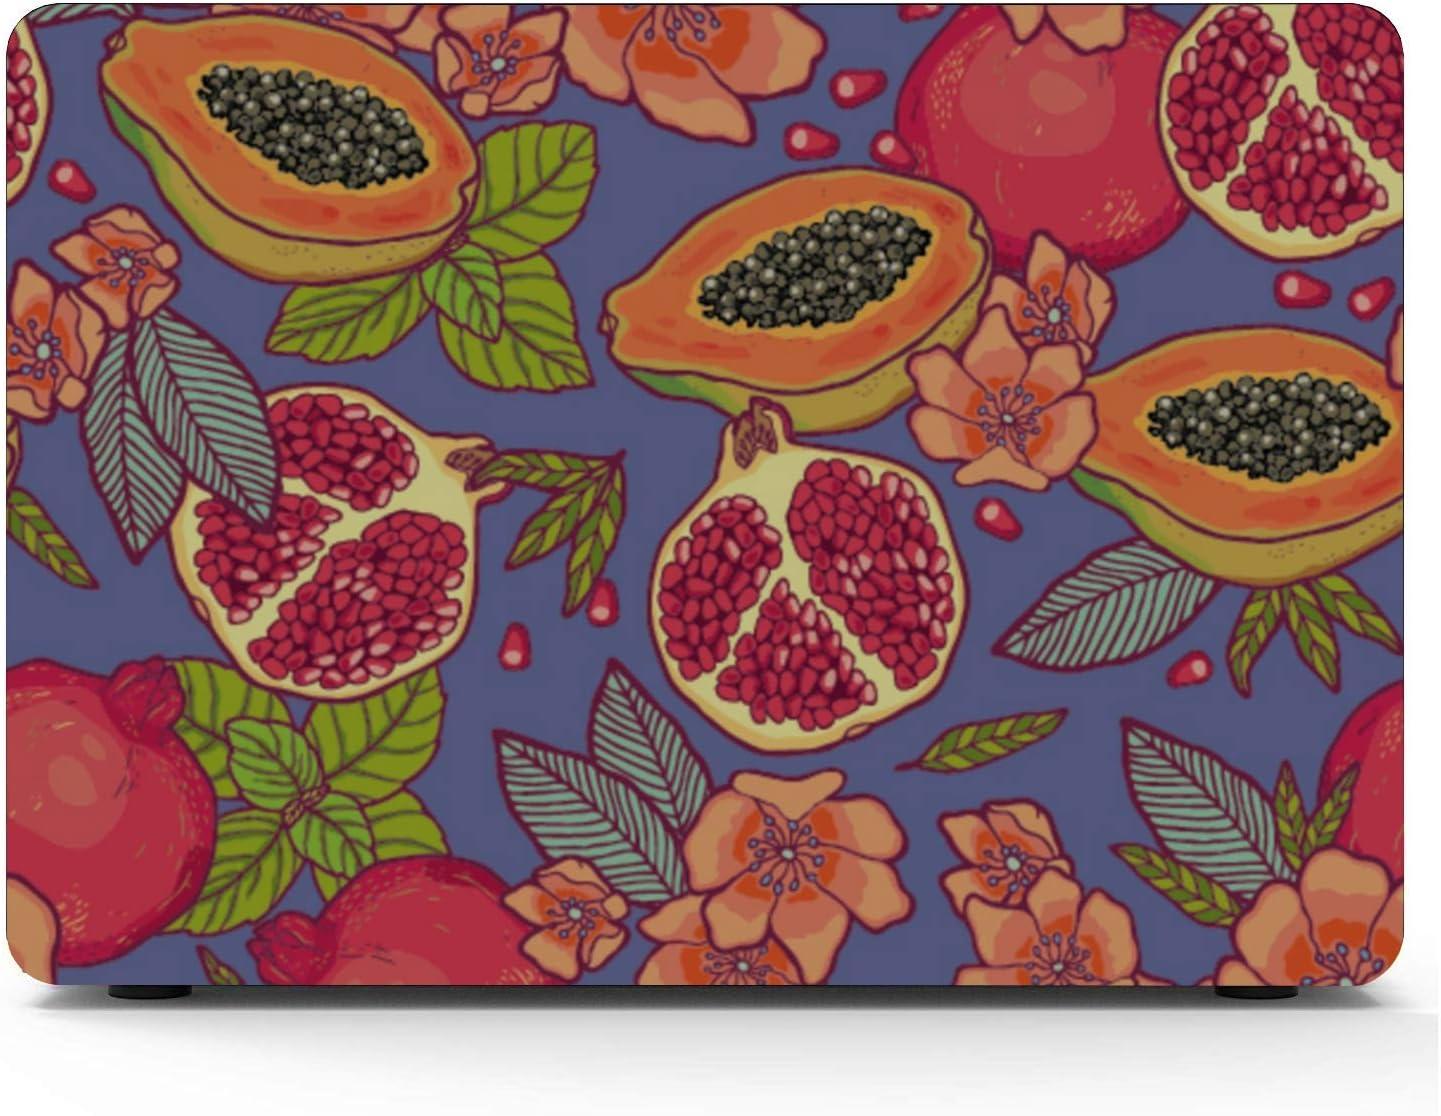 MacBook Pro Covers Summer Tropical Cute Papaya Fruit Plastic Hard Shell Compatible Mac Air 11 Pro 13 15 MacBook Pro Hard Cover Protection for MacBook 2016-2019 Version